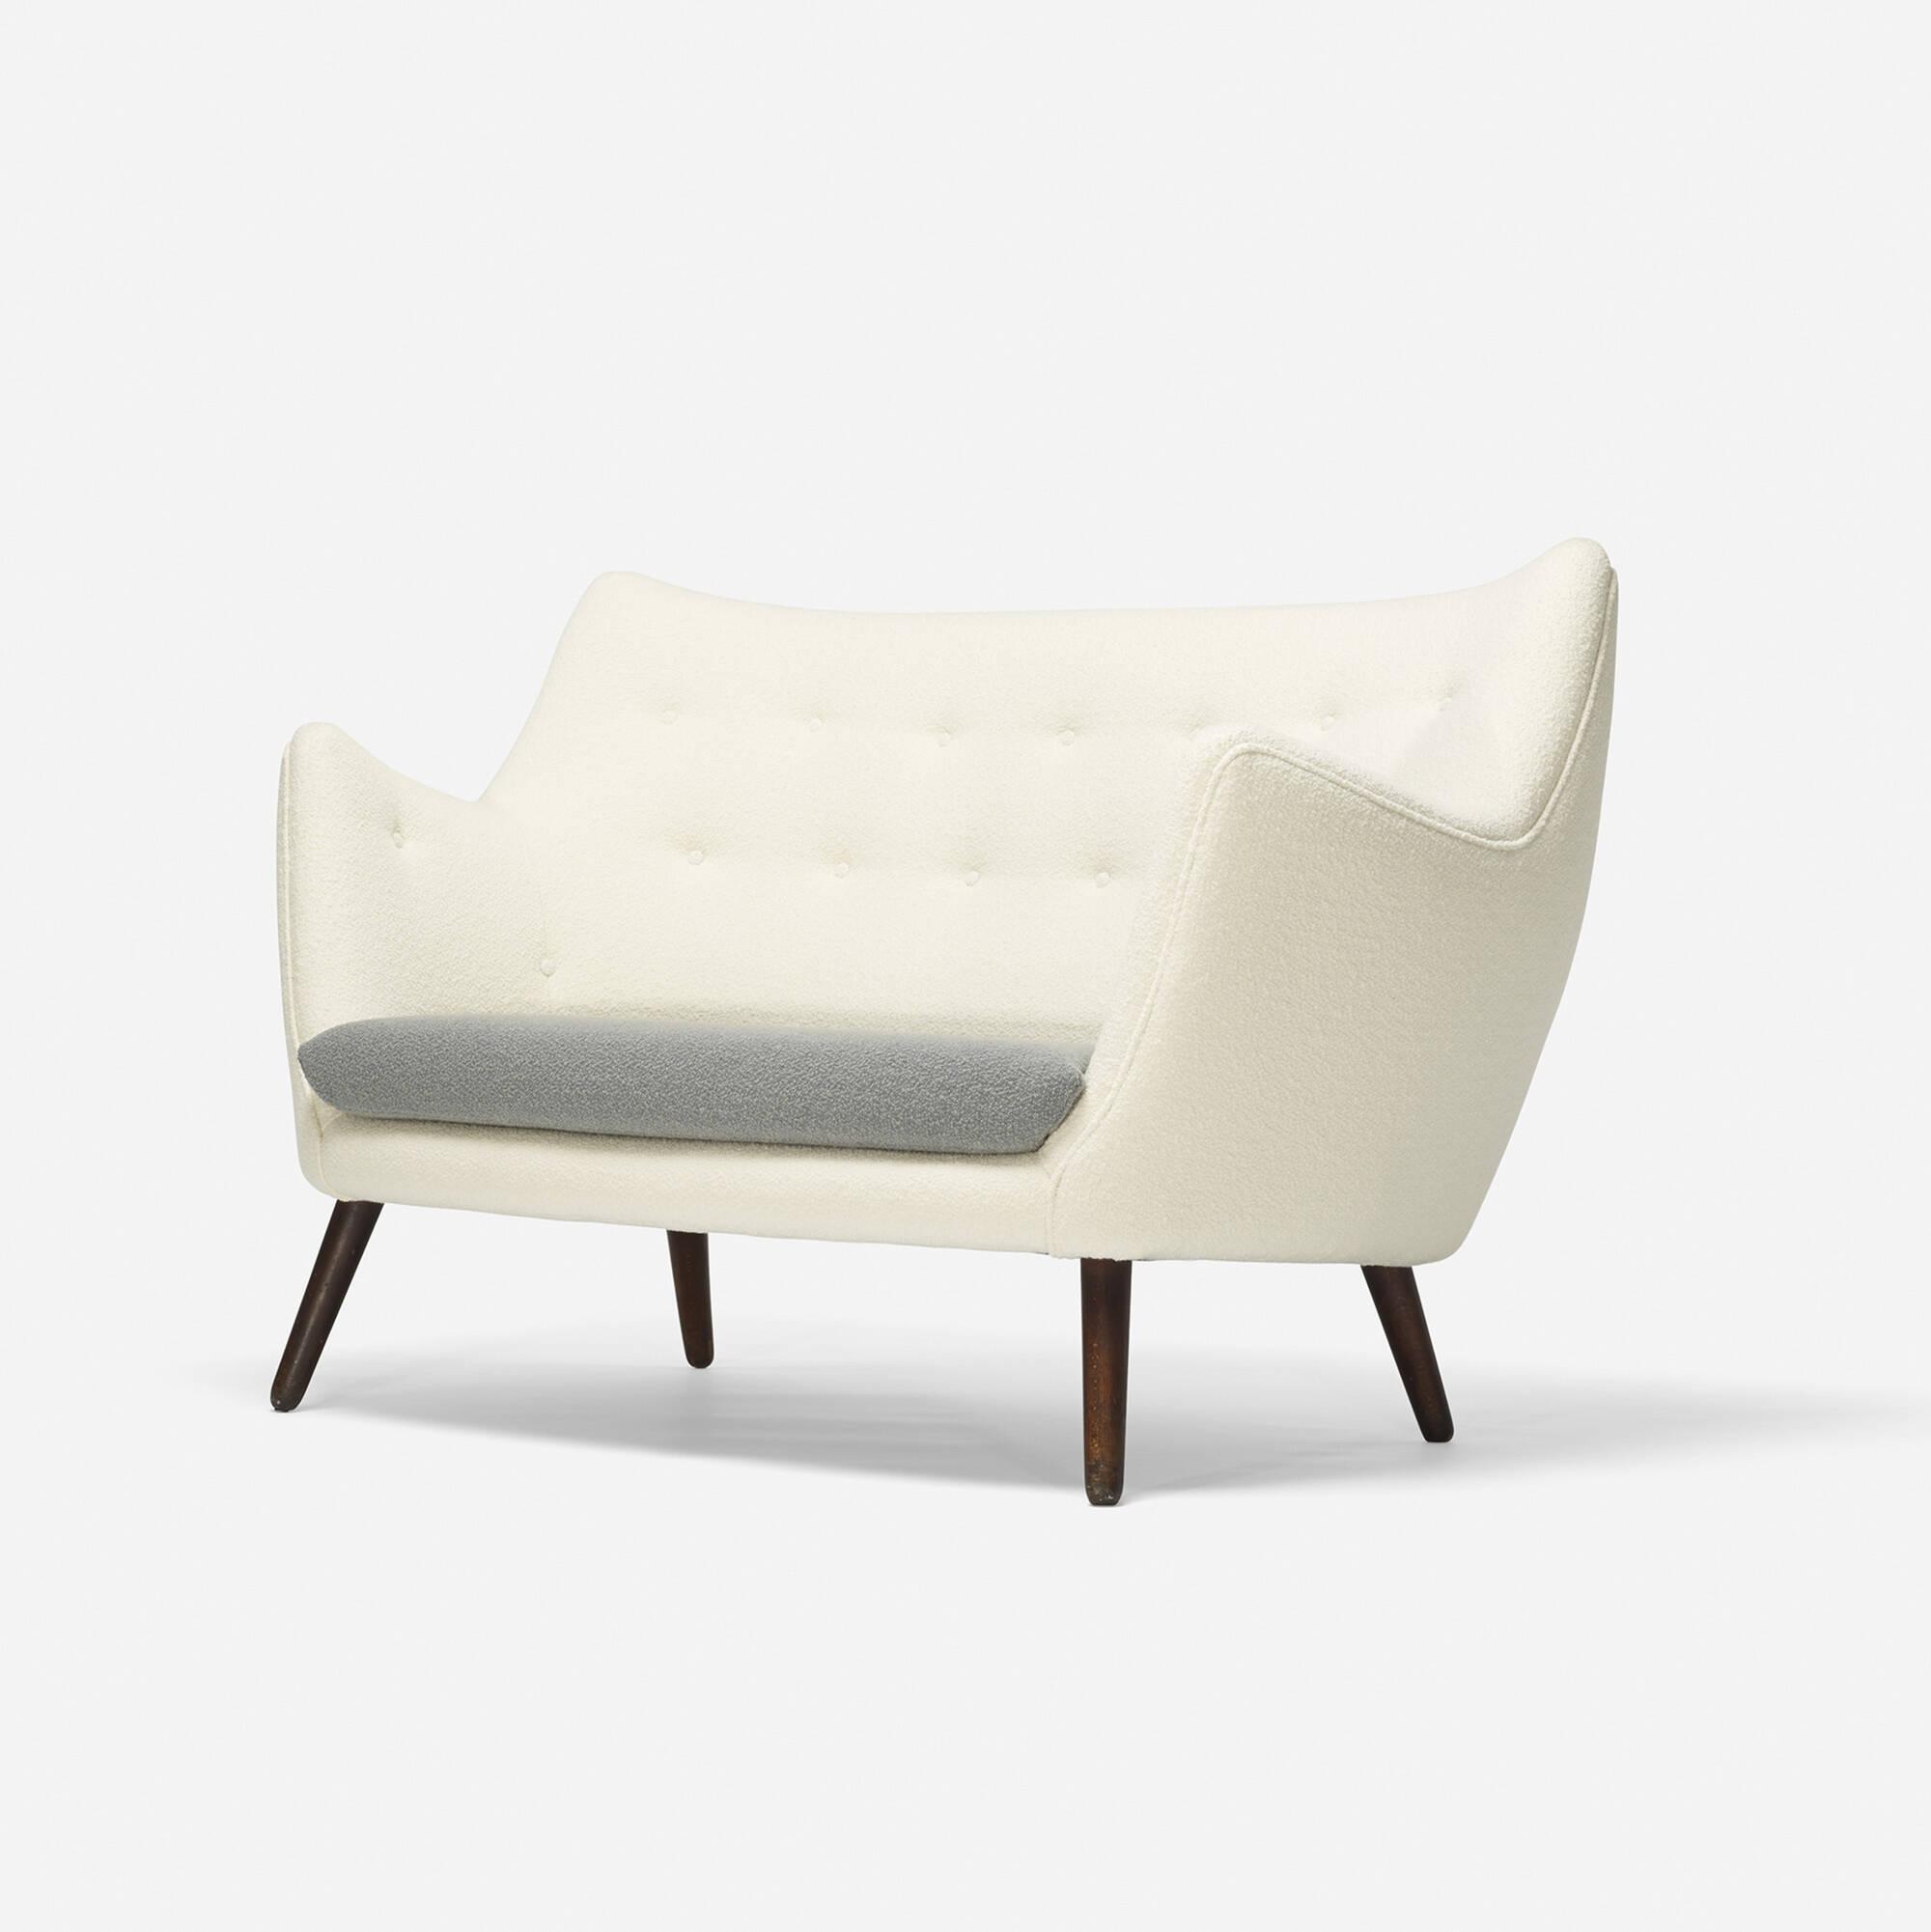 finn juhl poet sofa sale ava fabric large argos home and textiles